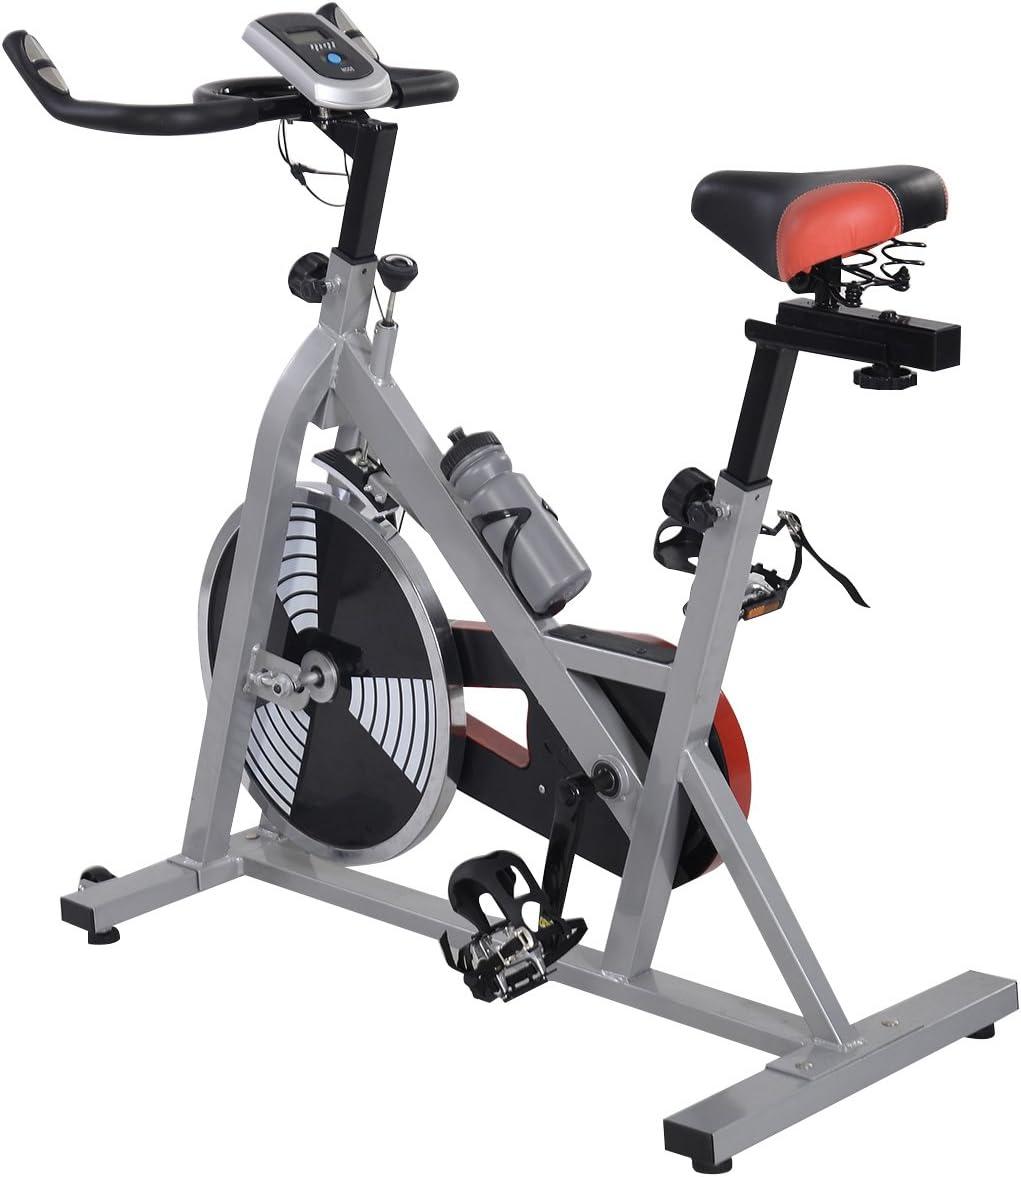 tangkula Spinning Bike Ciclismo indoor salud Fitness bicicleta ...